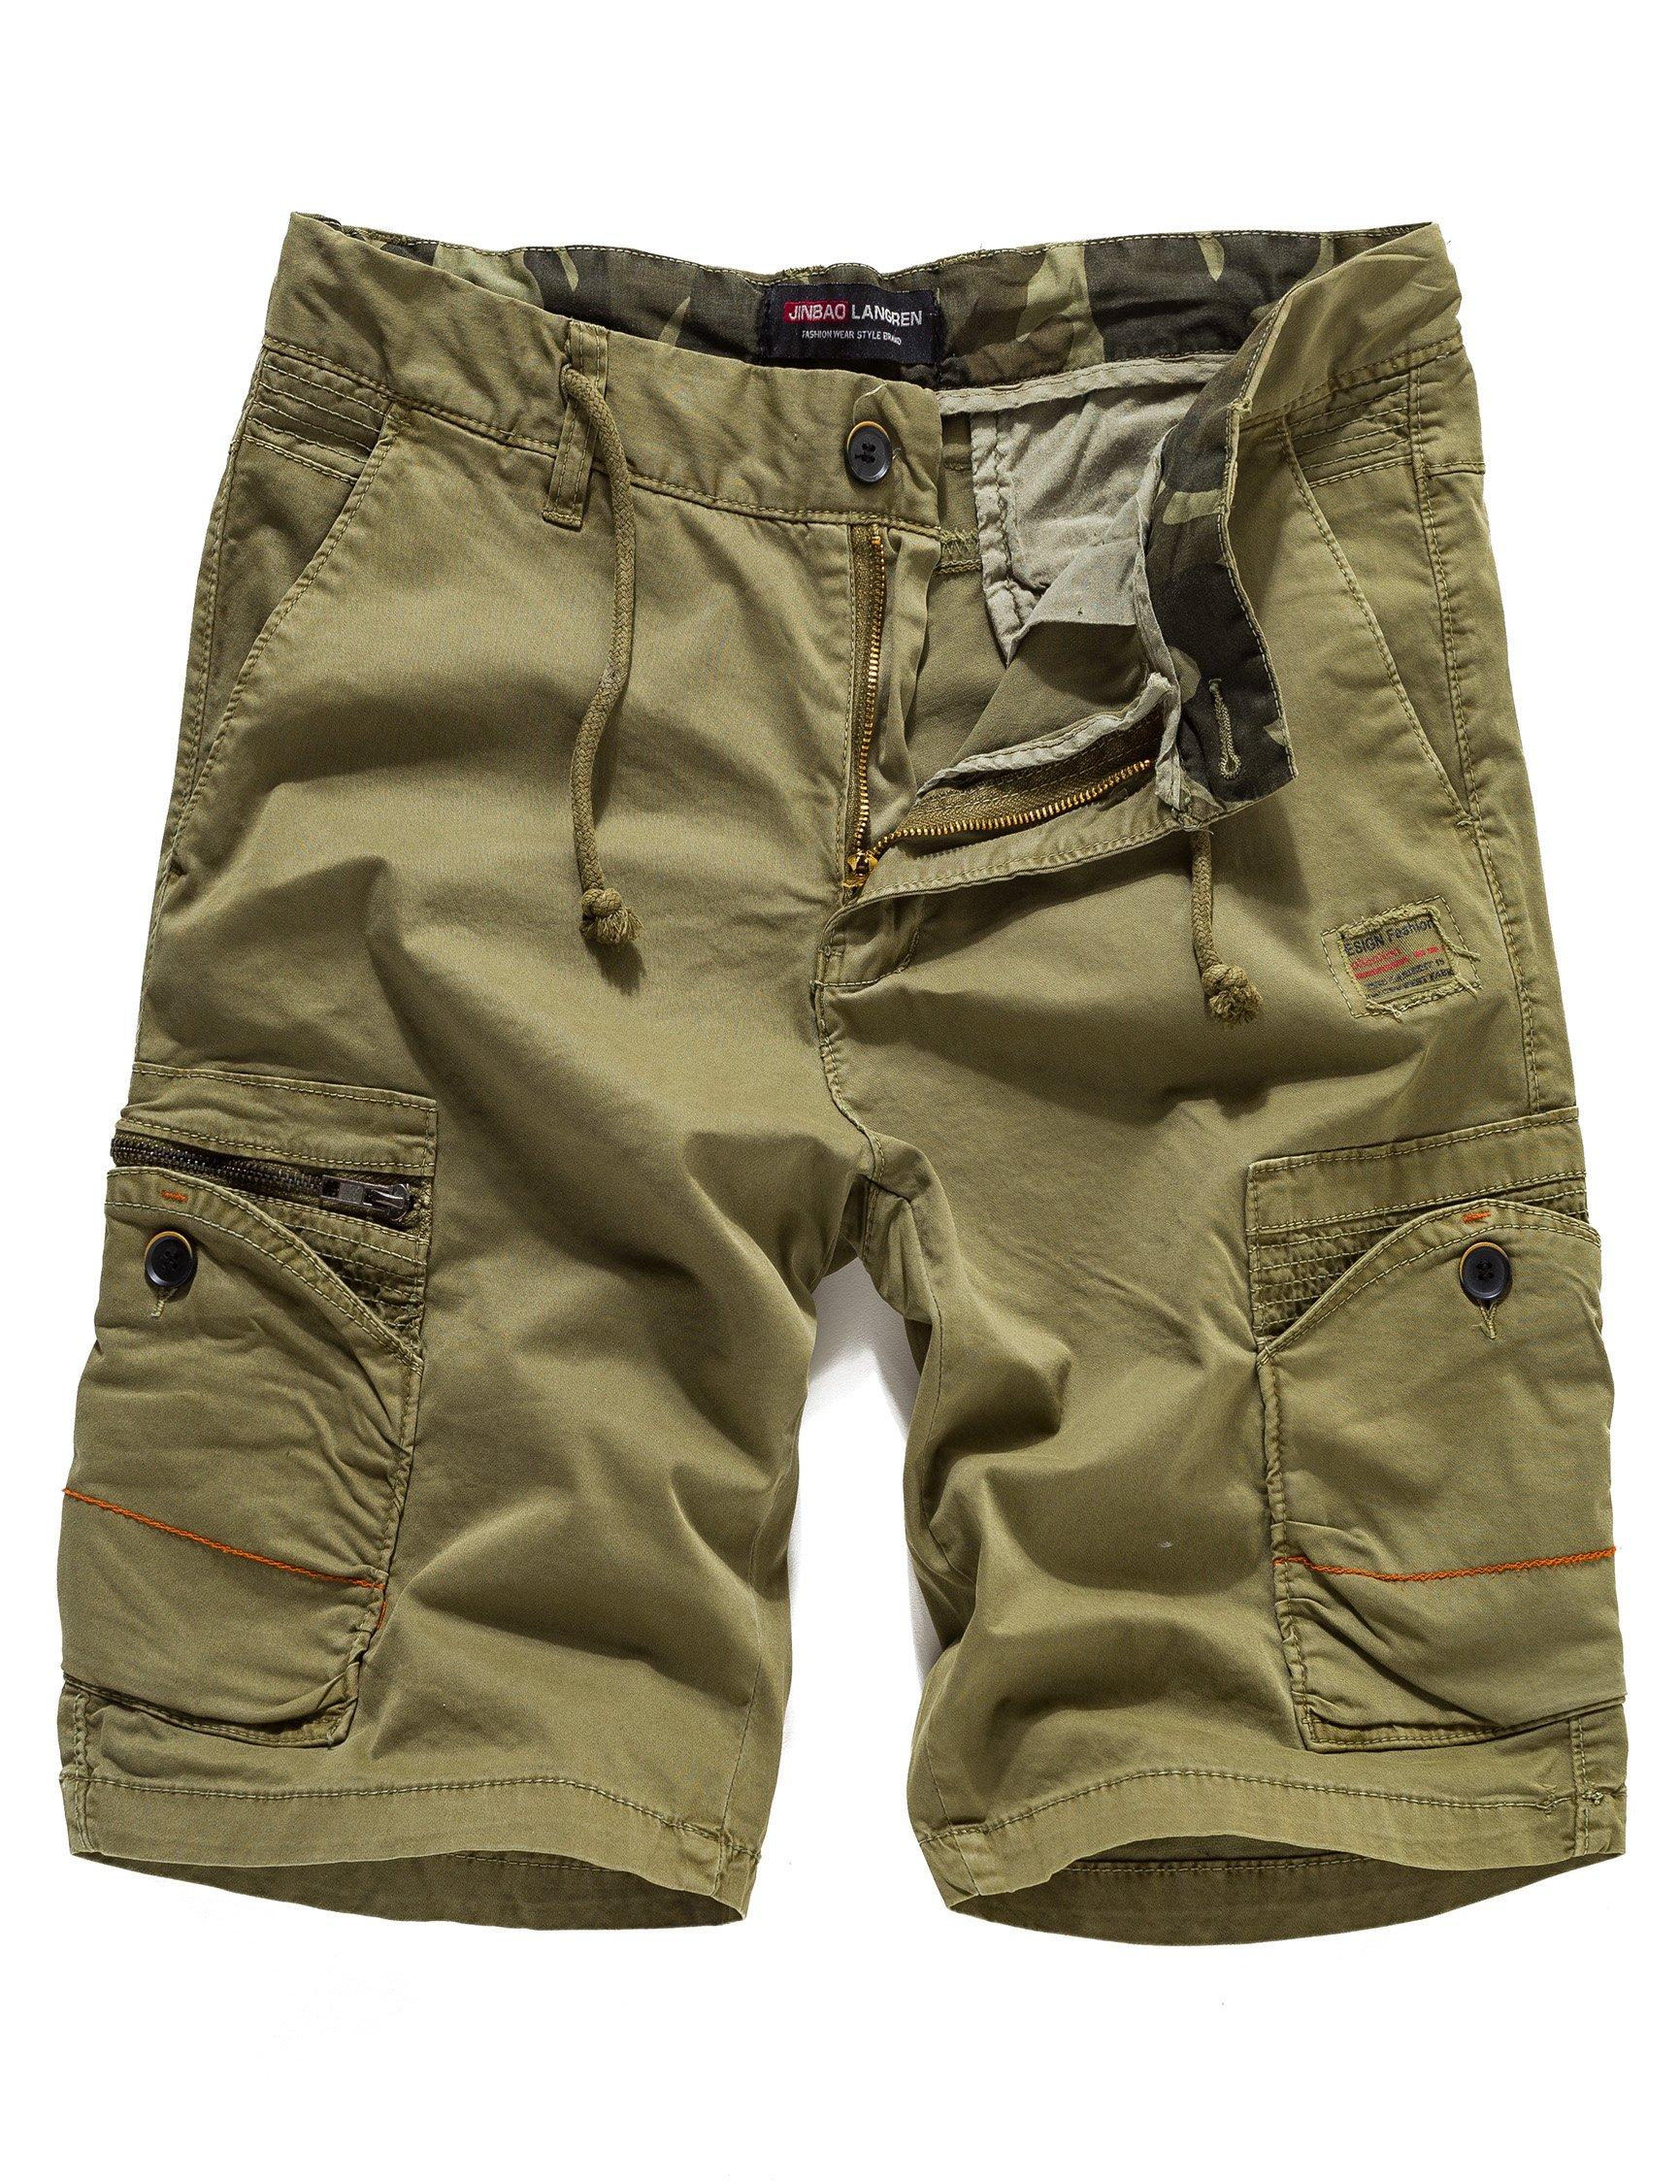 Eaglide Mens Casual Cargo Shorts, Mens Slim Fit Athletic Biking Casual Chino Shorts (Khaki, 38W)